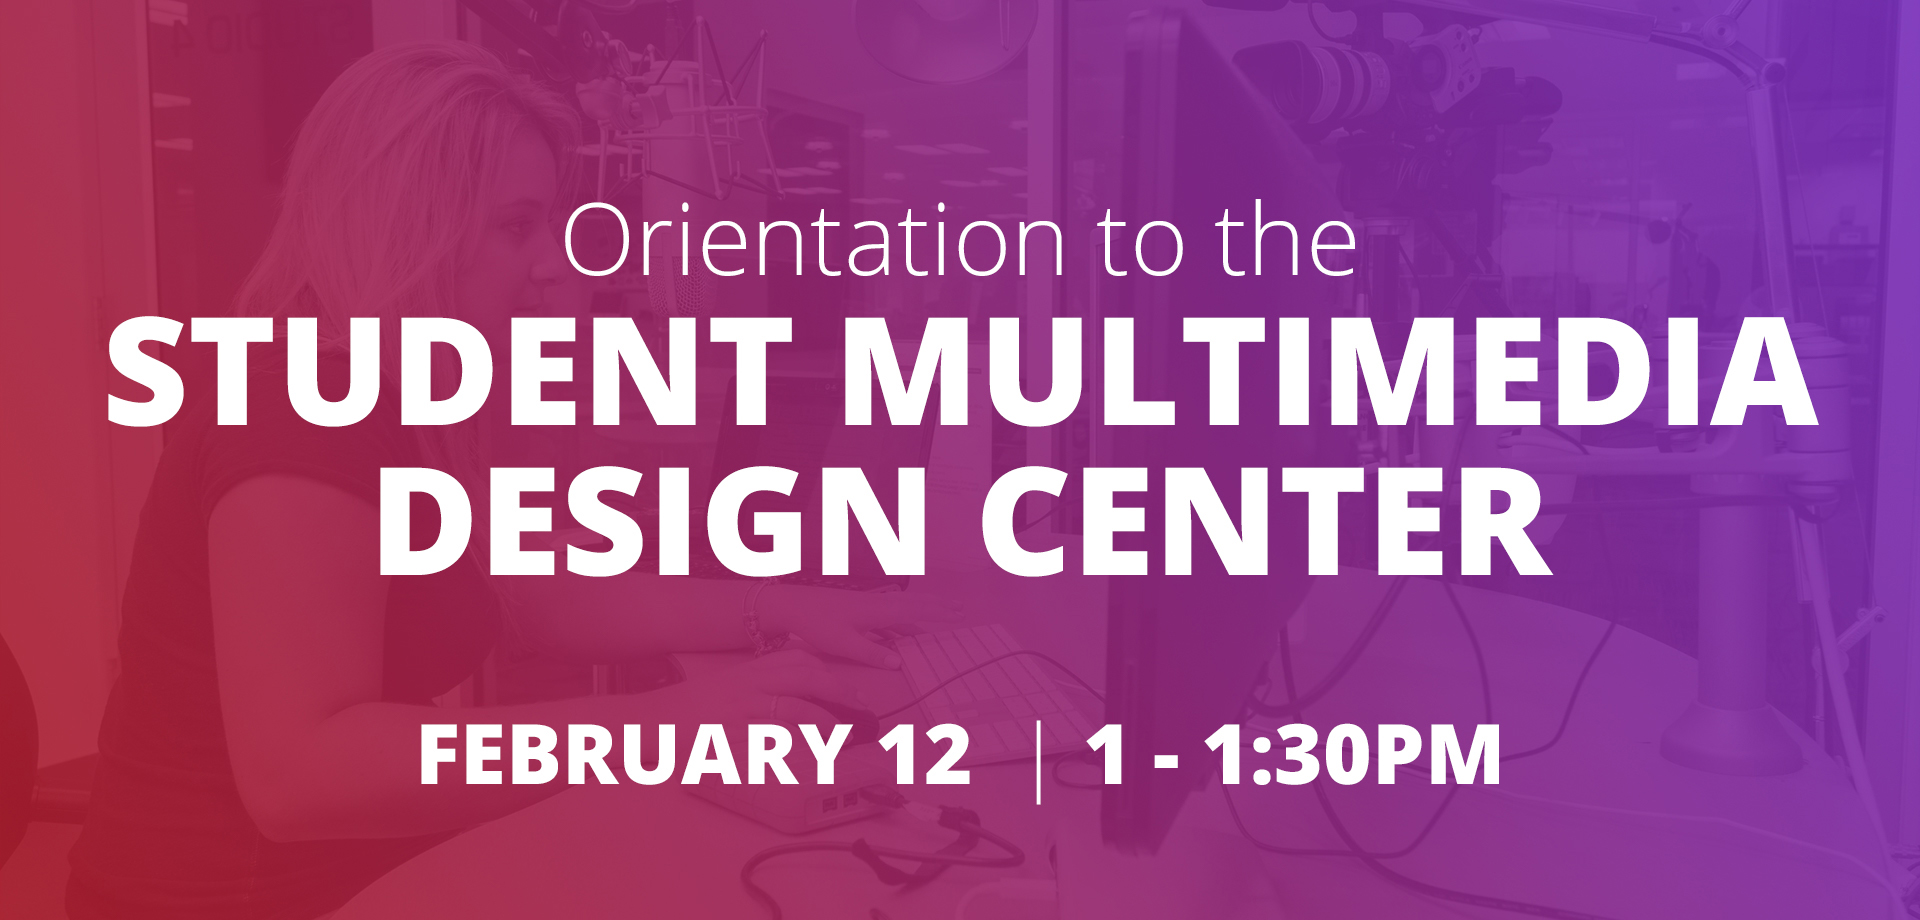 Student Multimedia Design Center Orientation